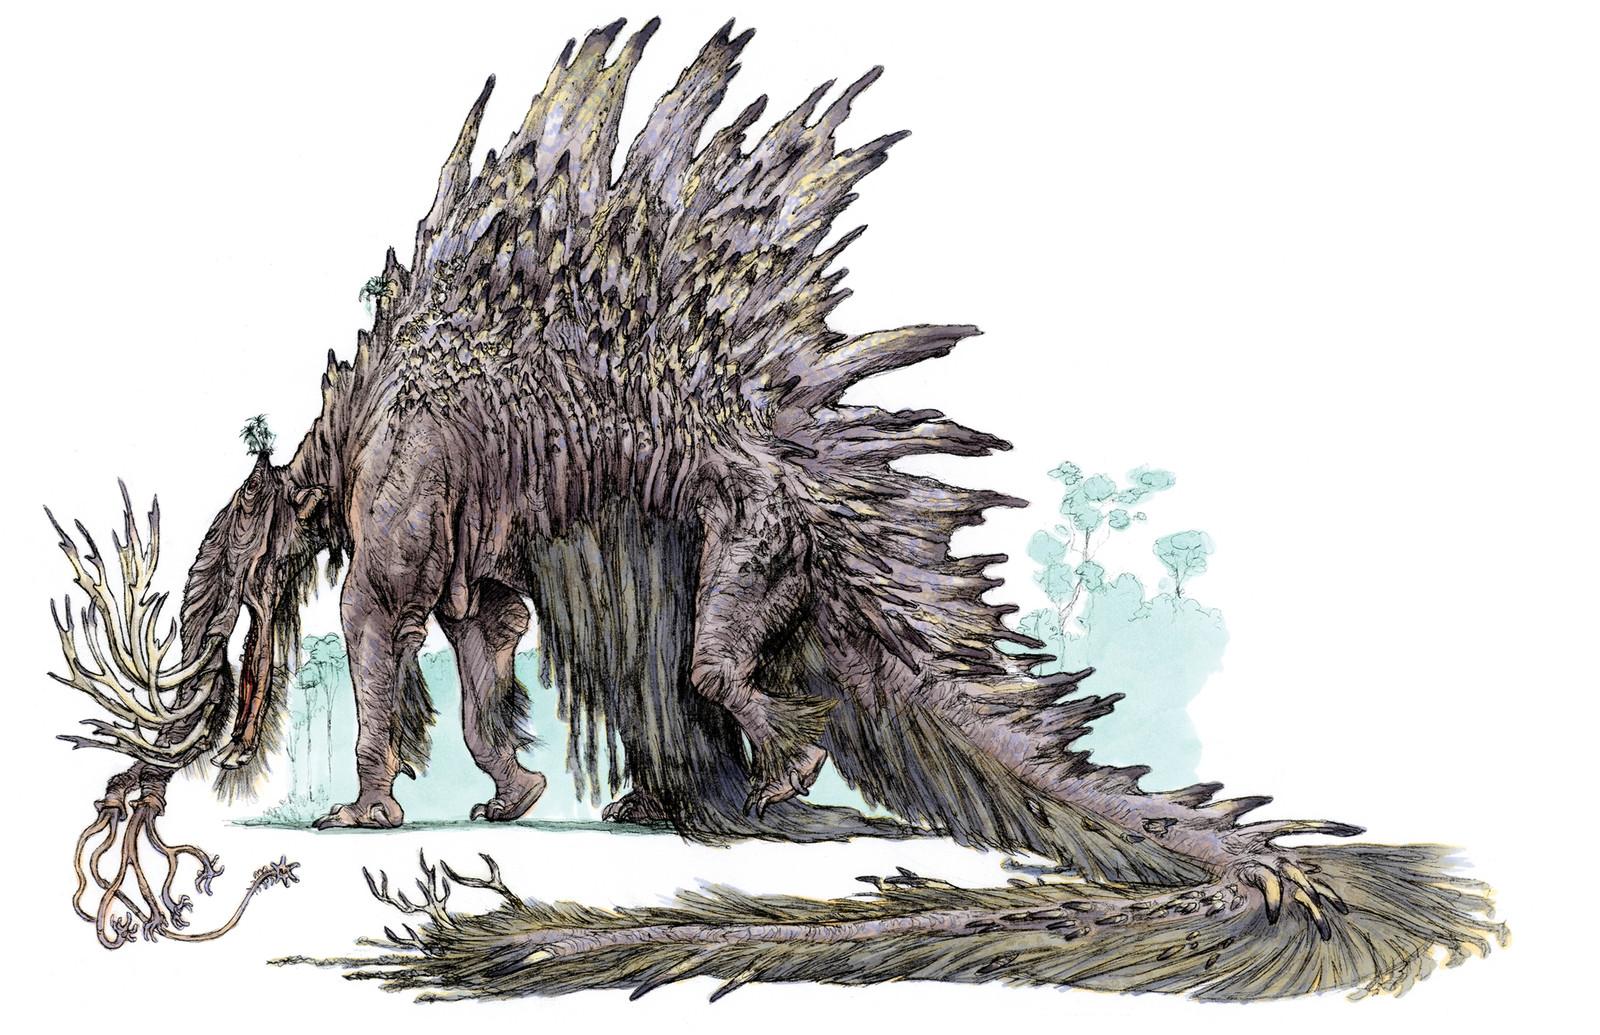 The Behemoth